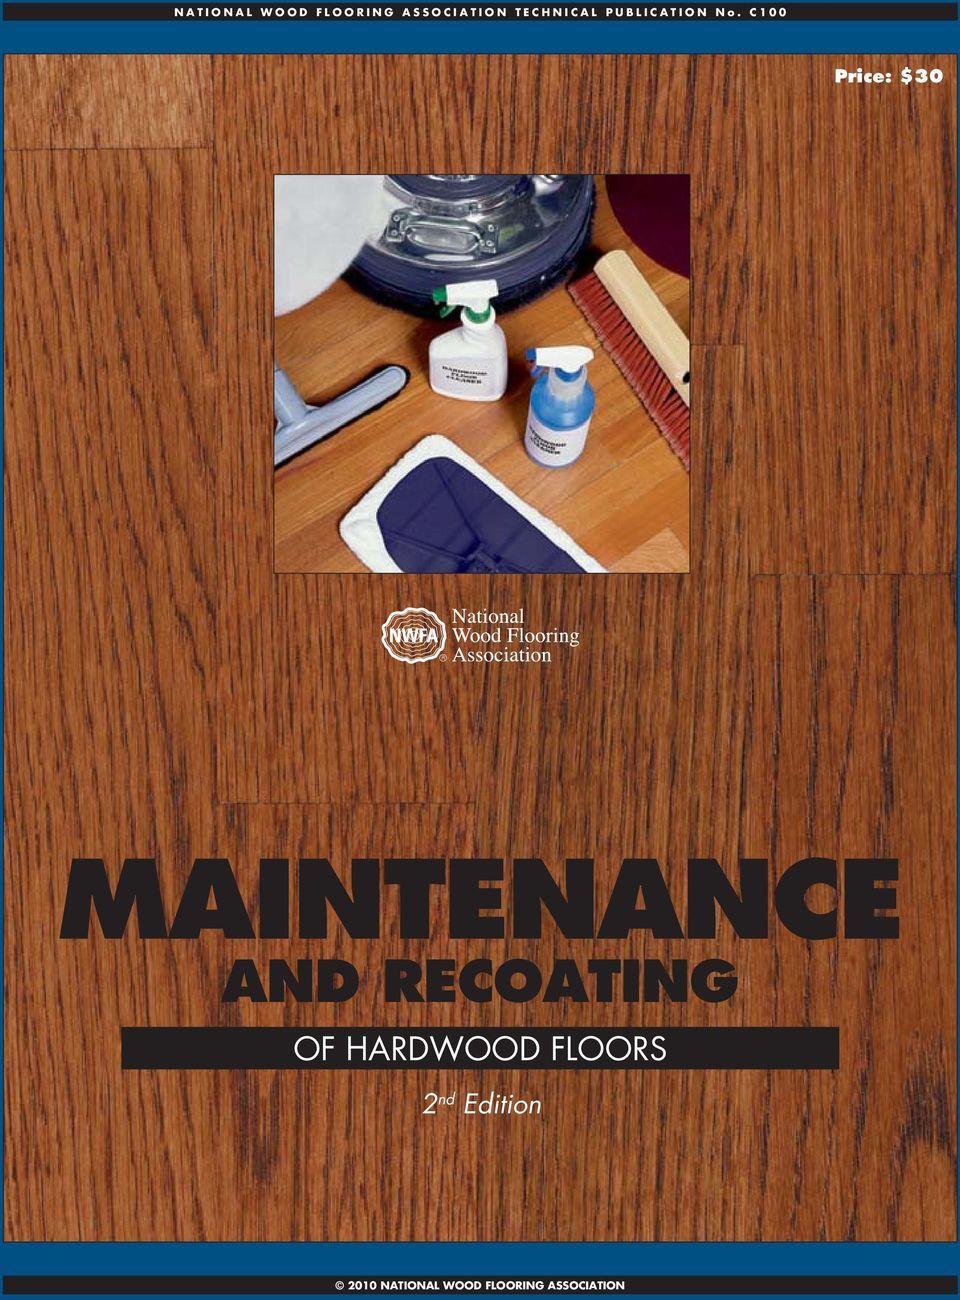 hardwood floor installers cincinnati of maintenance and recoating of hardwood floors 2 nd edition price pertaining to floors 2 nd edition 2010